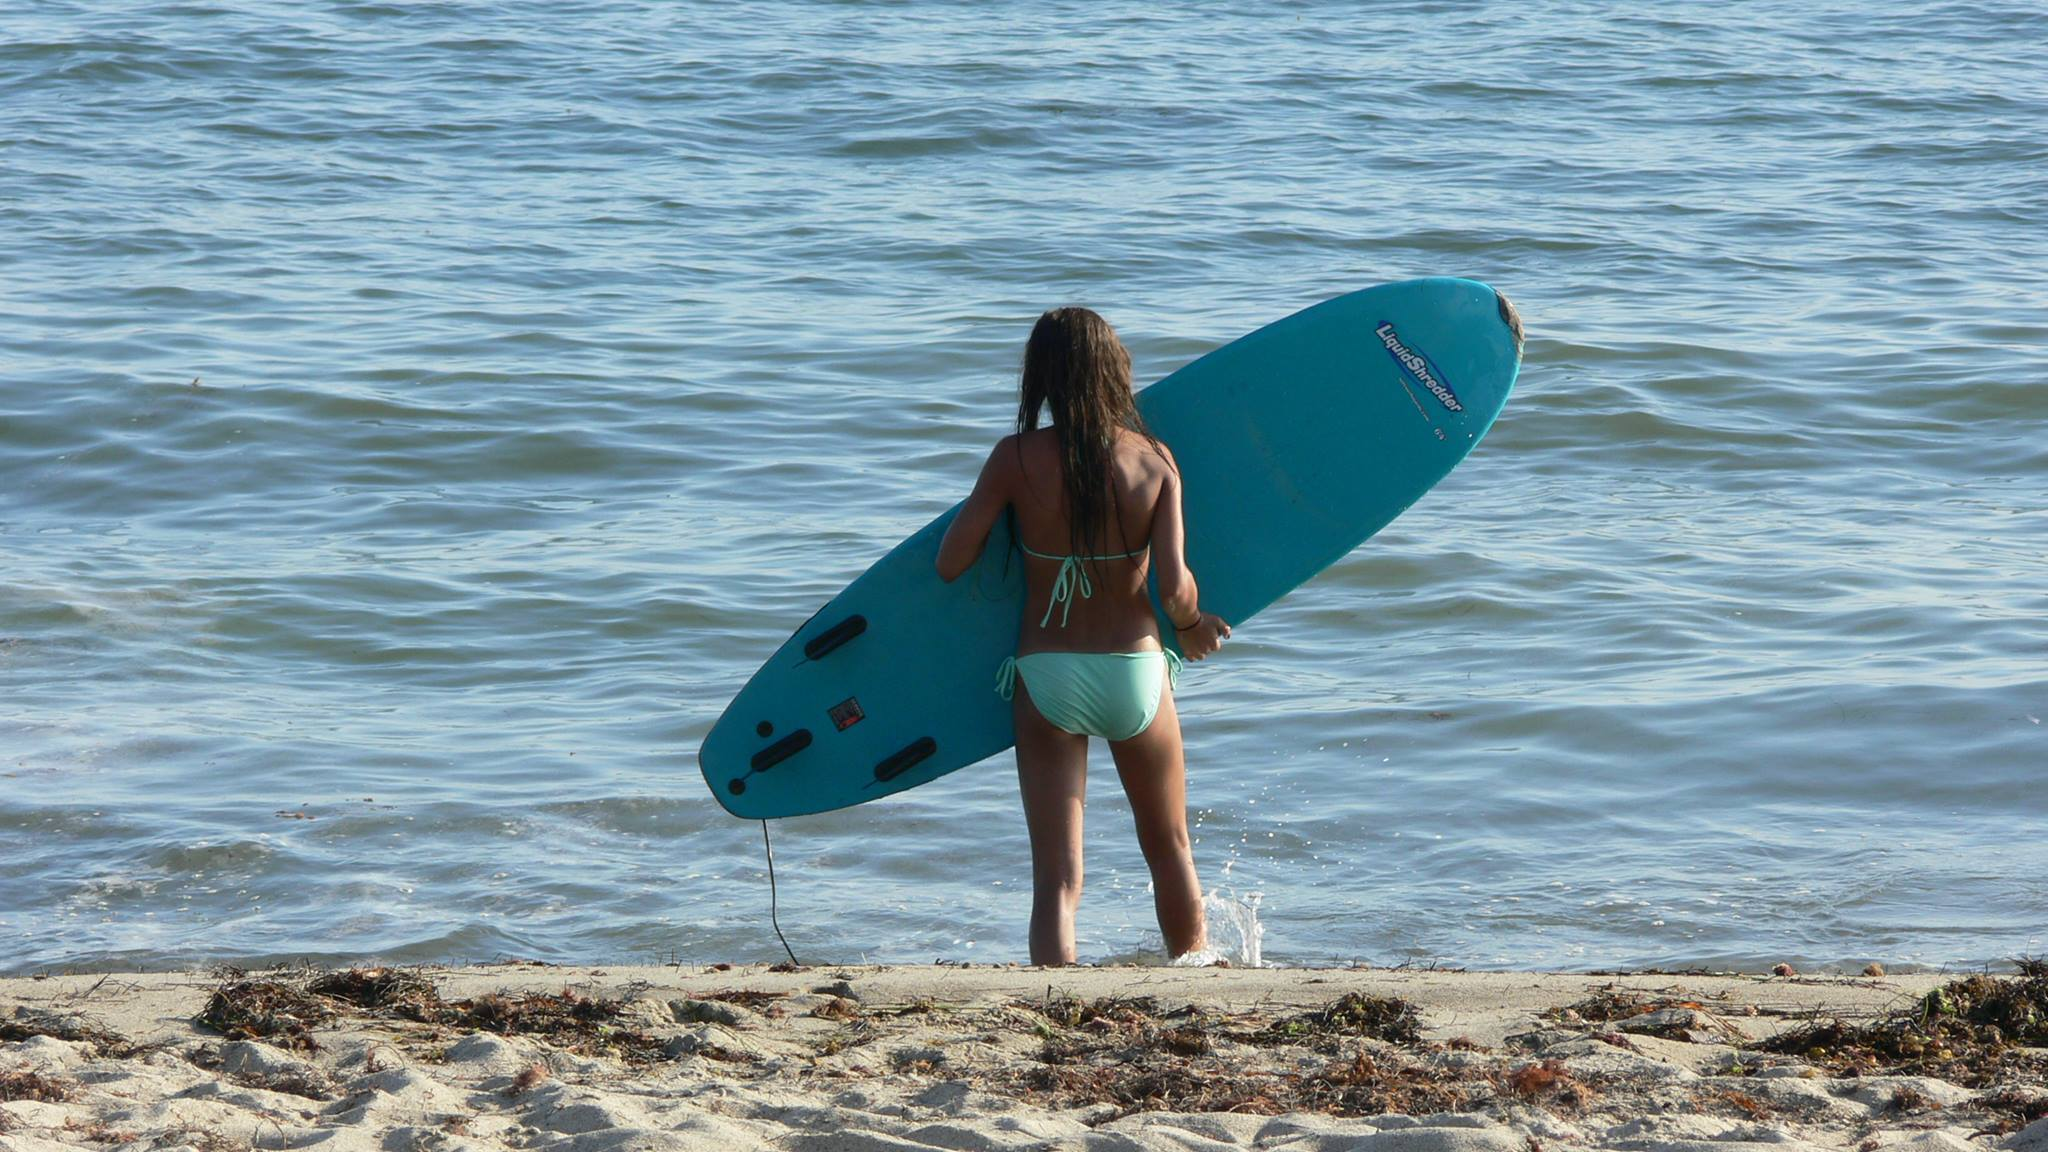 hot surf girls in bikinis 5